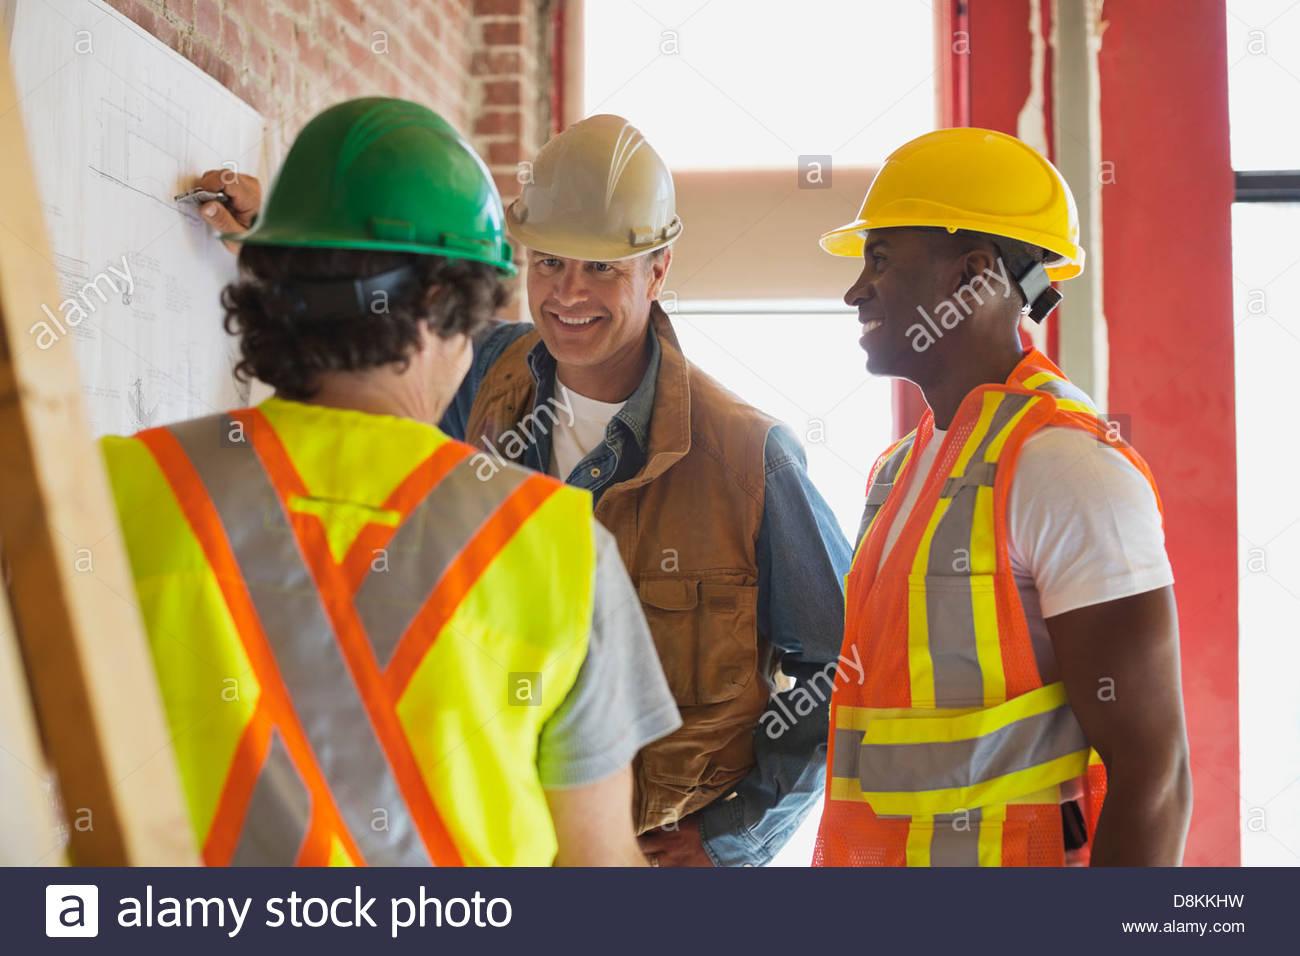 Foreman explaining plan on blueprint to tradesmen at construction site - Stock Image